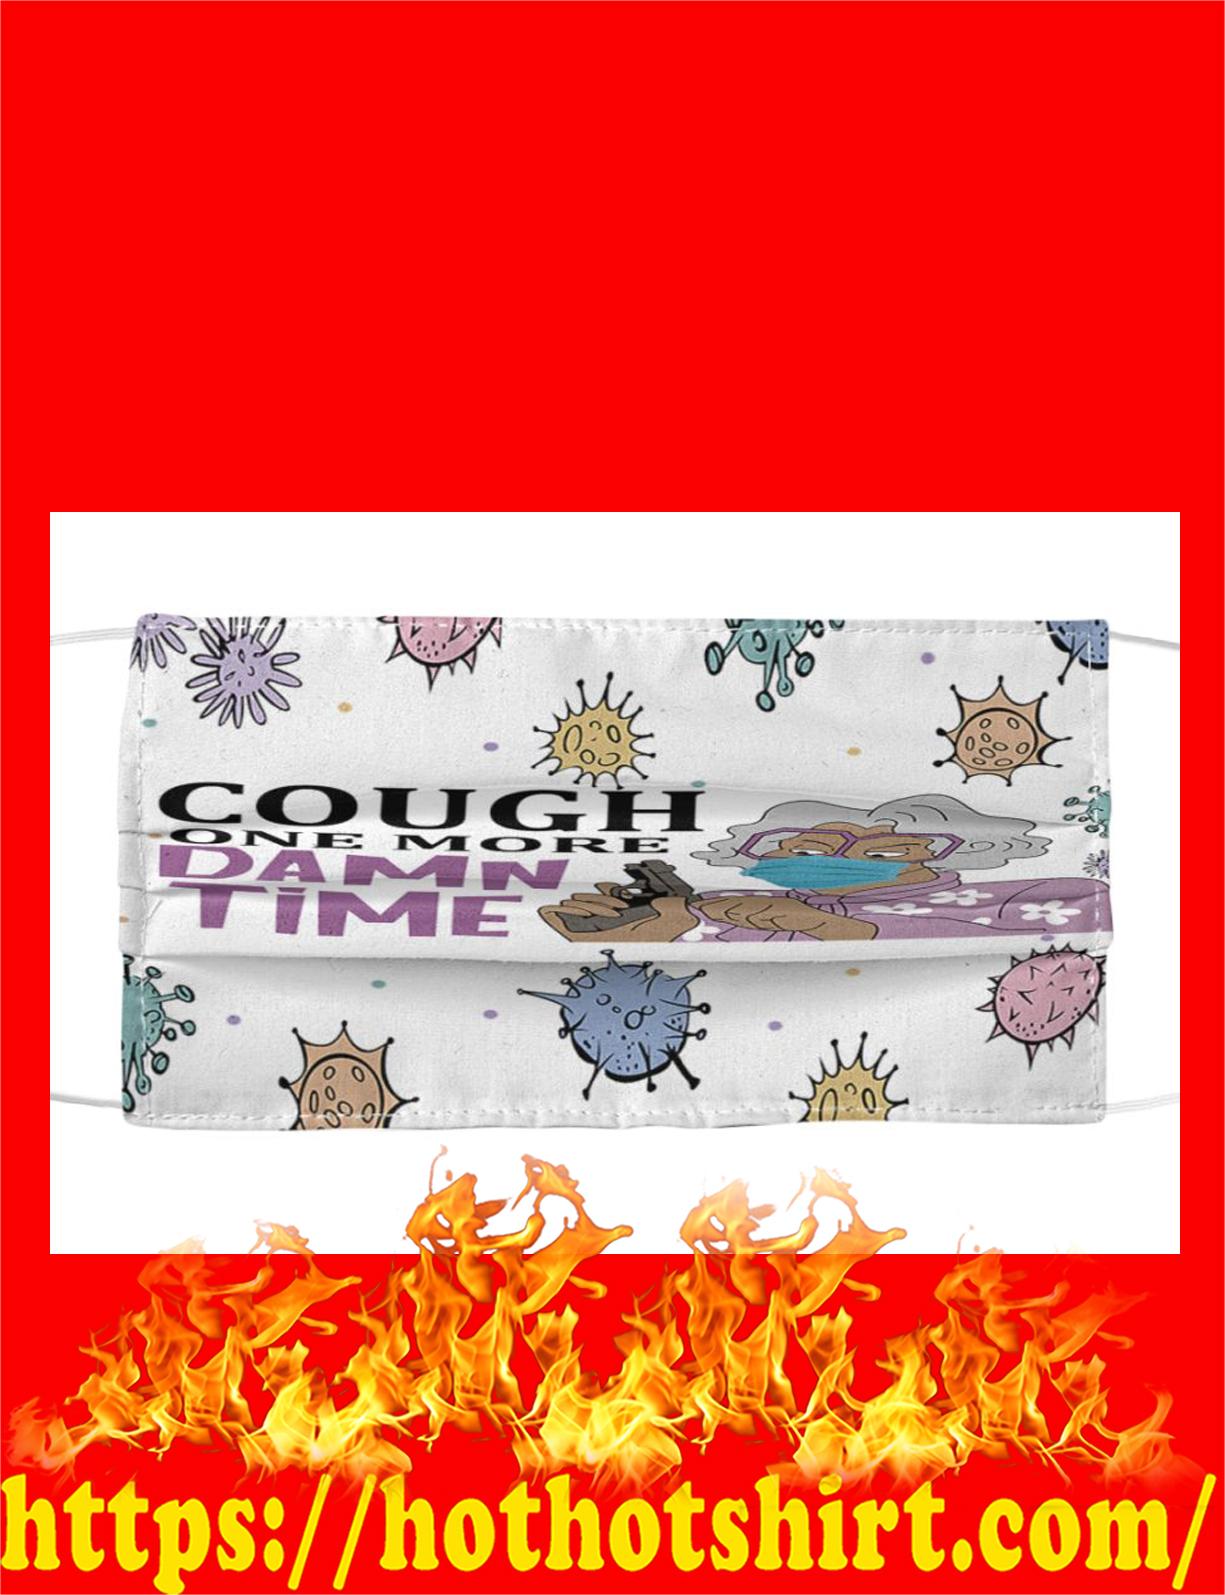 Coronavirus Grandma Cough one more damn time cloth mask - detail